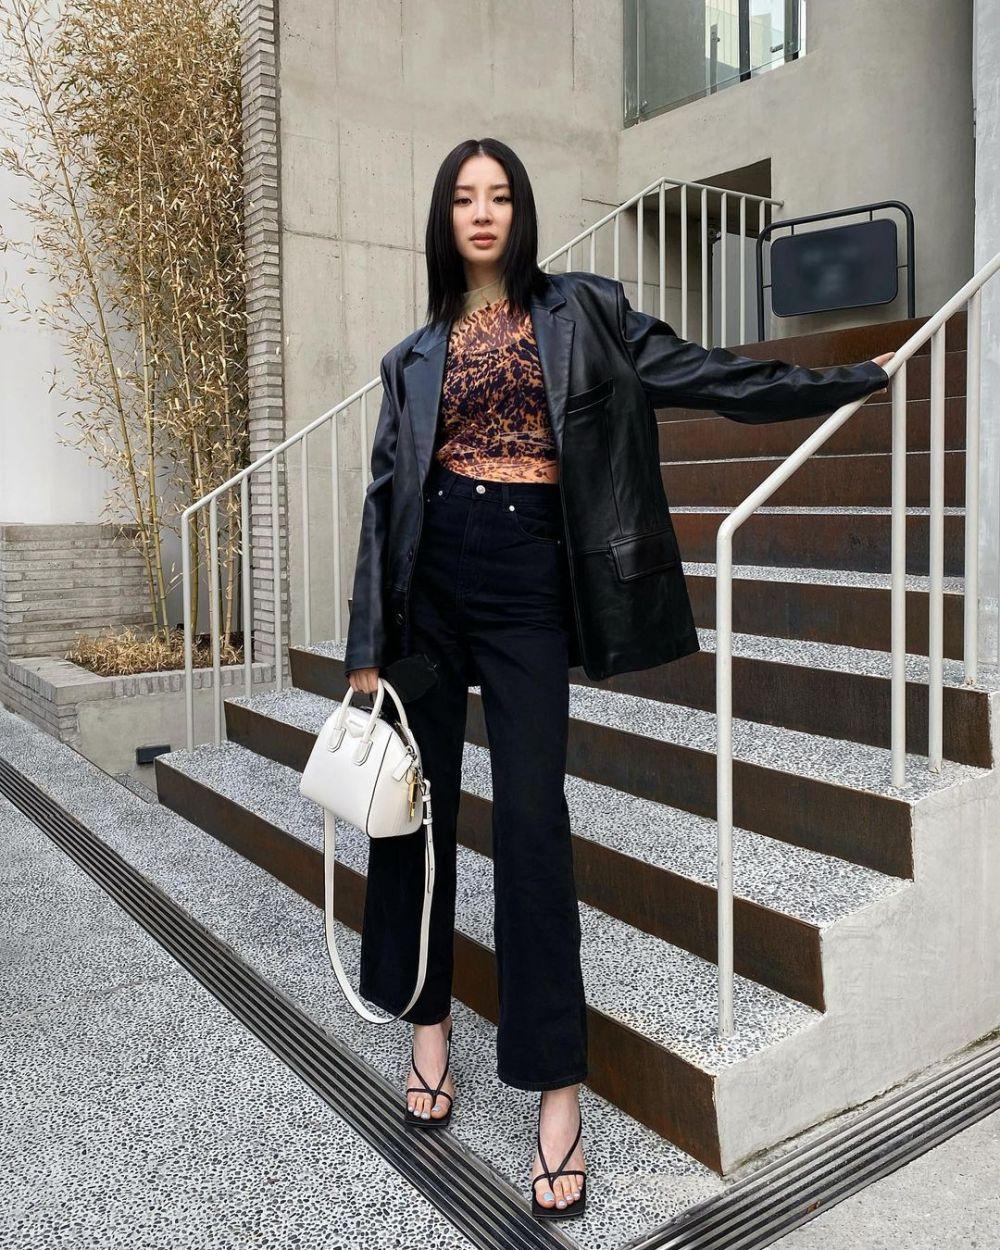 10 Potret Irene Kim, Model dan Influencer Korea yang Penuh Talenta